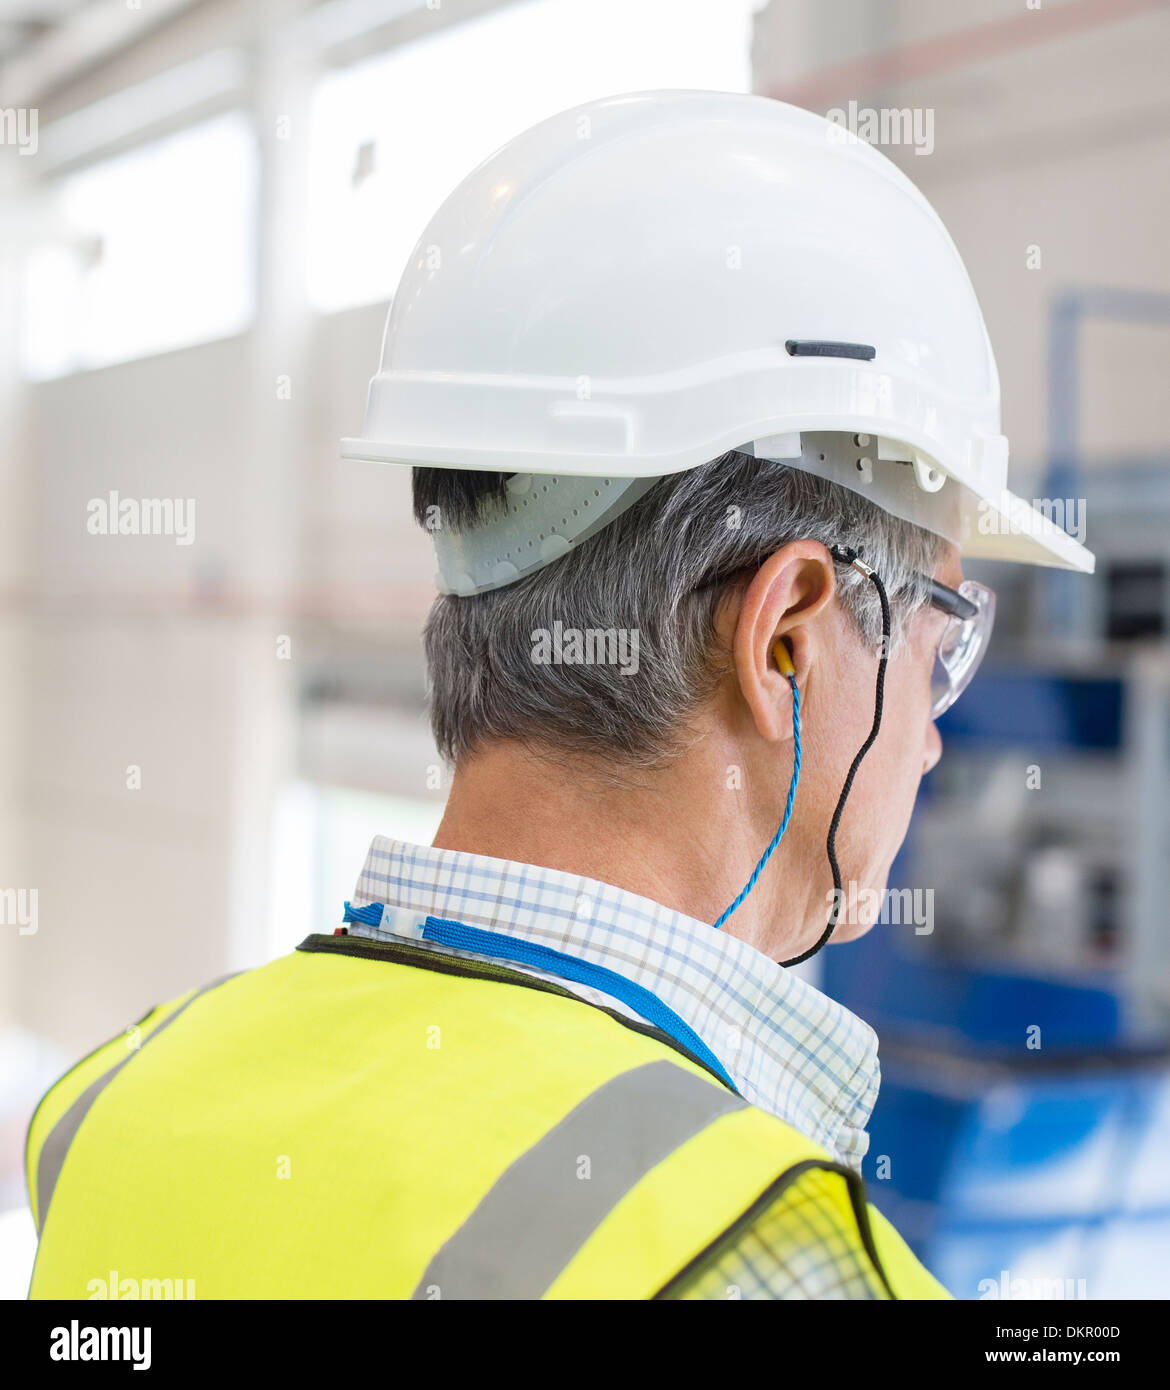 Worker wearing hard hat et bouchons d'oreilles. Photo Stock